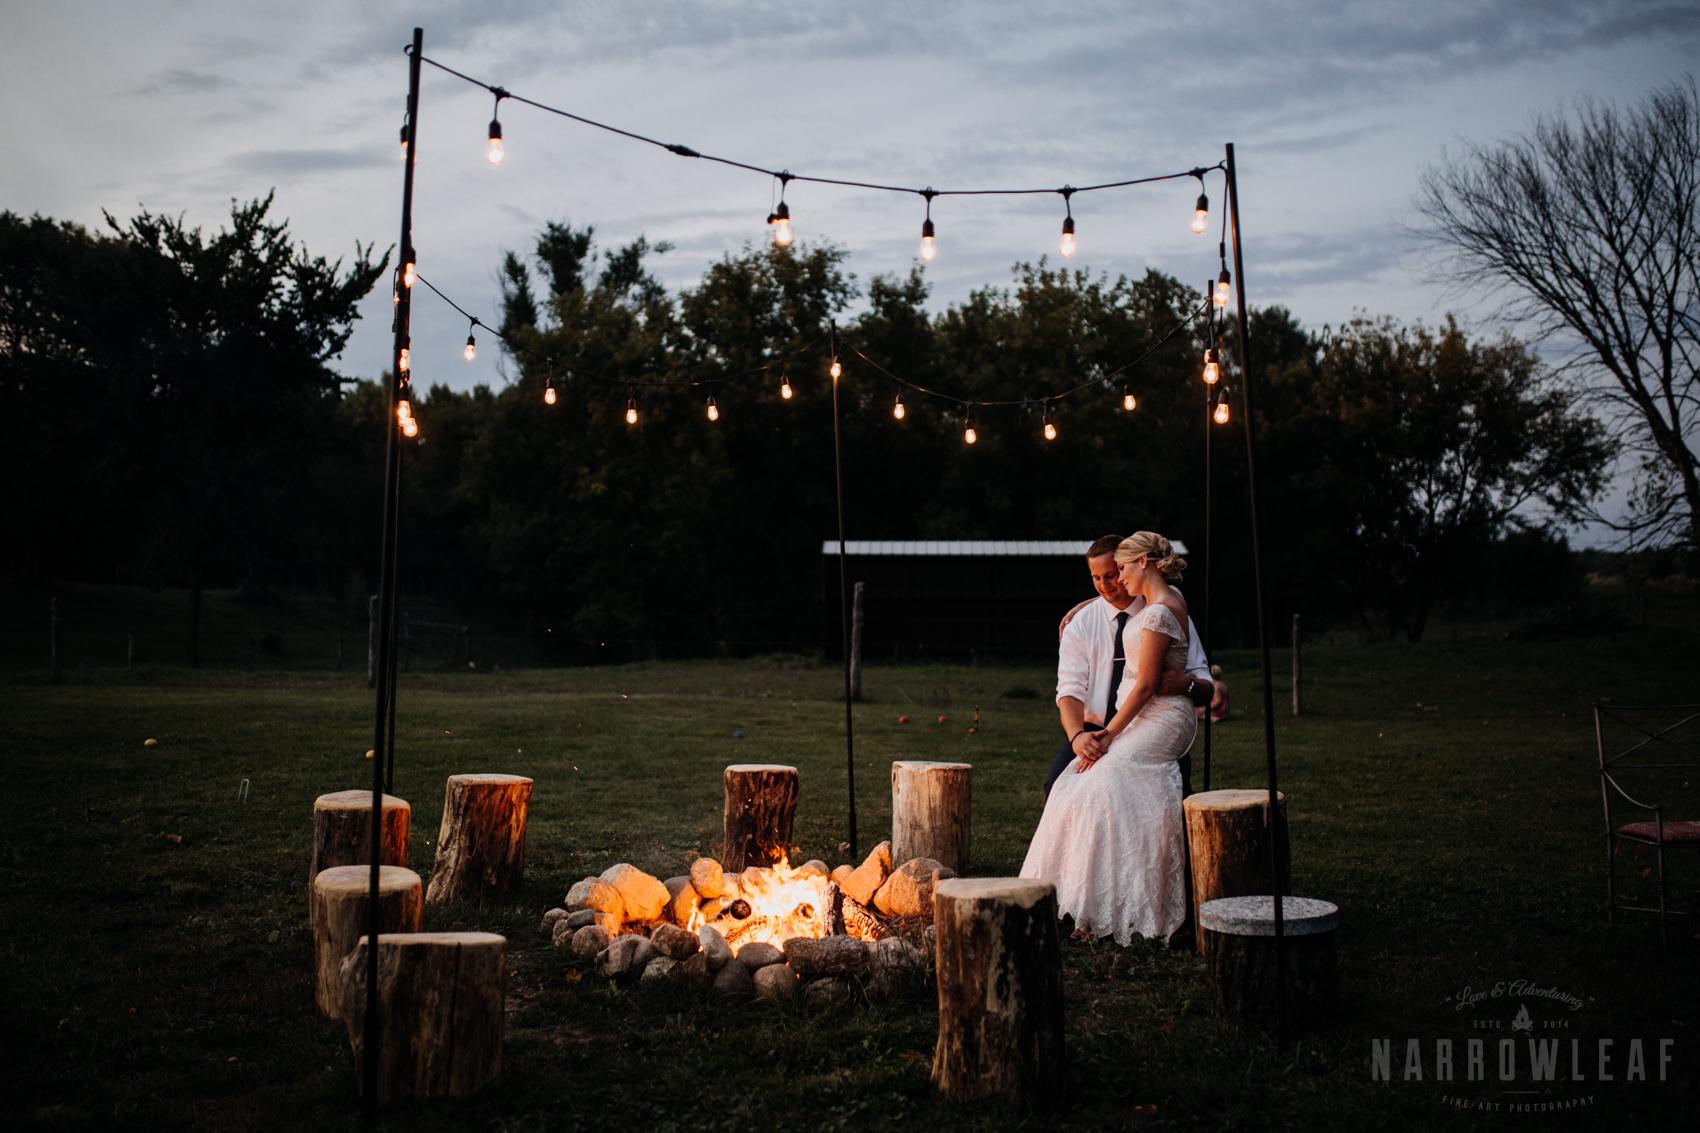 bride-groom-cuddling-by-the-bonfire-under-cafe-lights-night-33.jpg